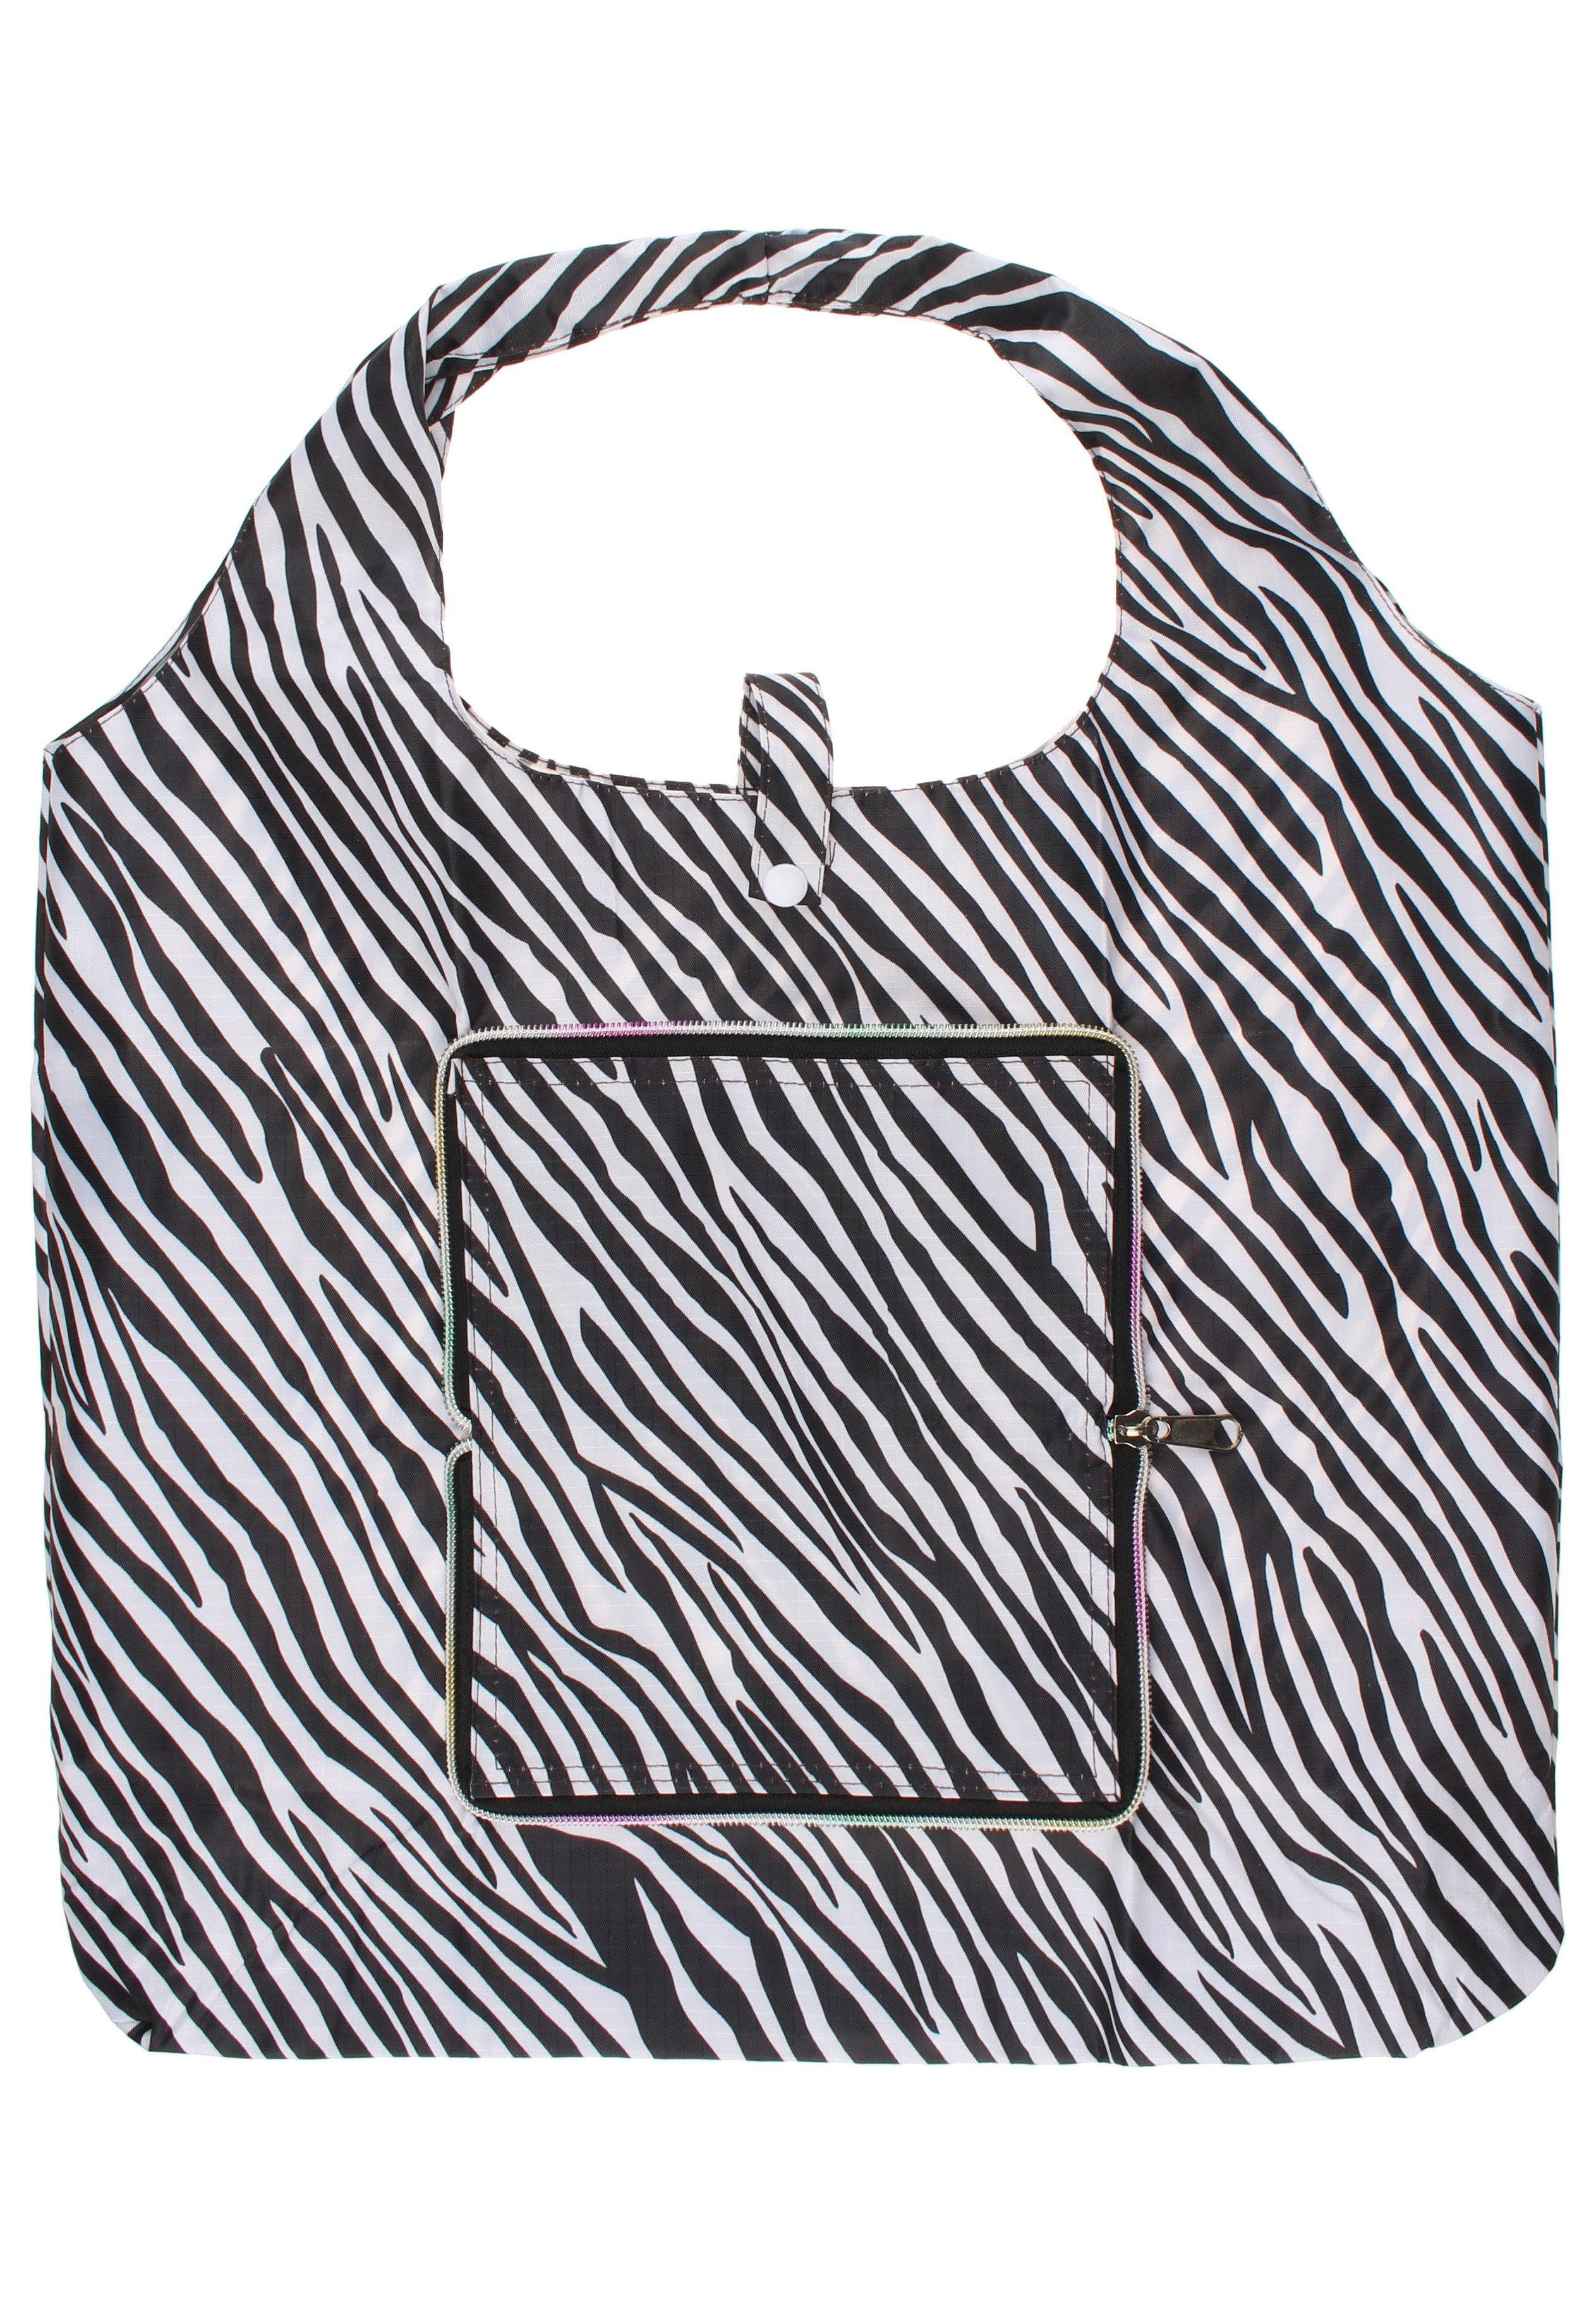 Mymo Accessories B0n21e07a-a11 - Torba Na Zakupy Zebra